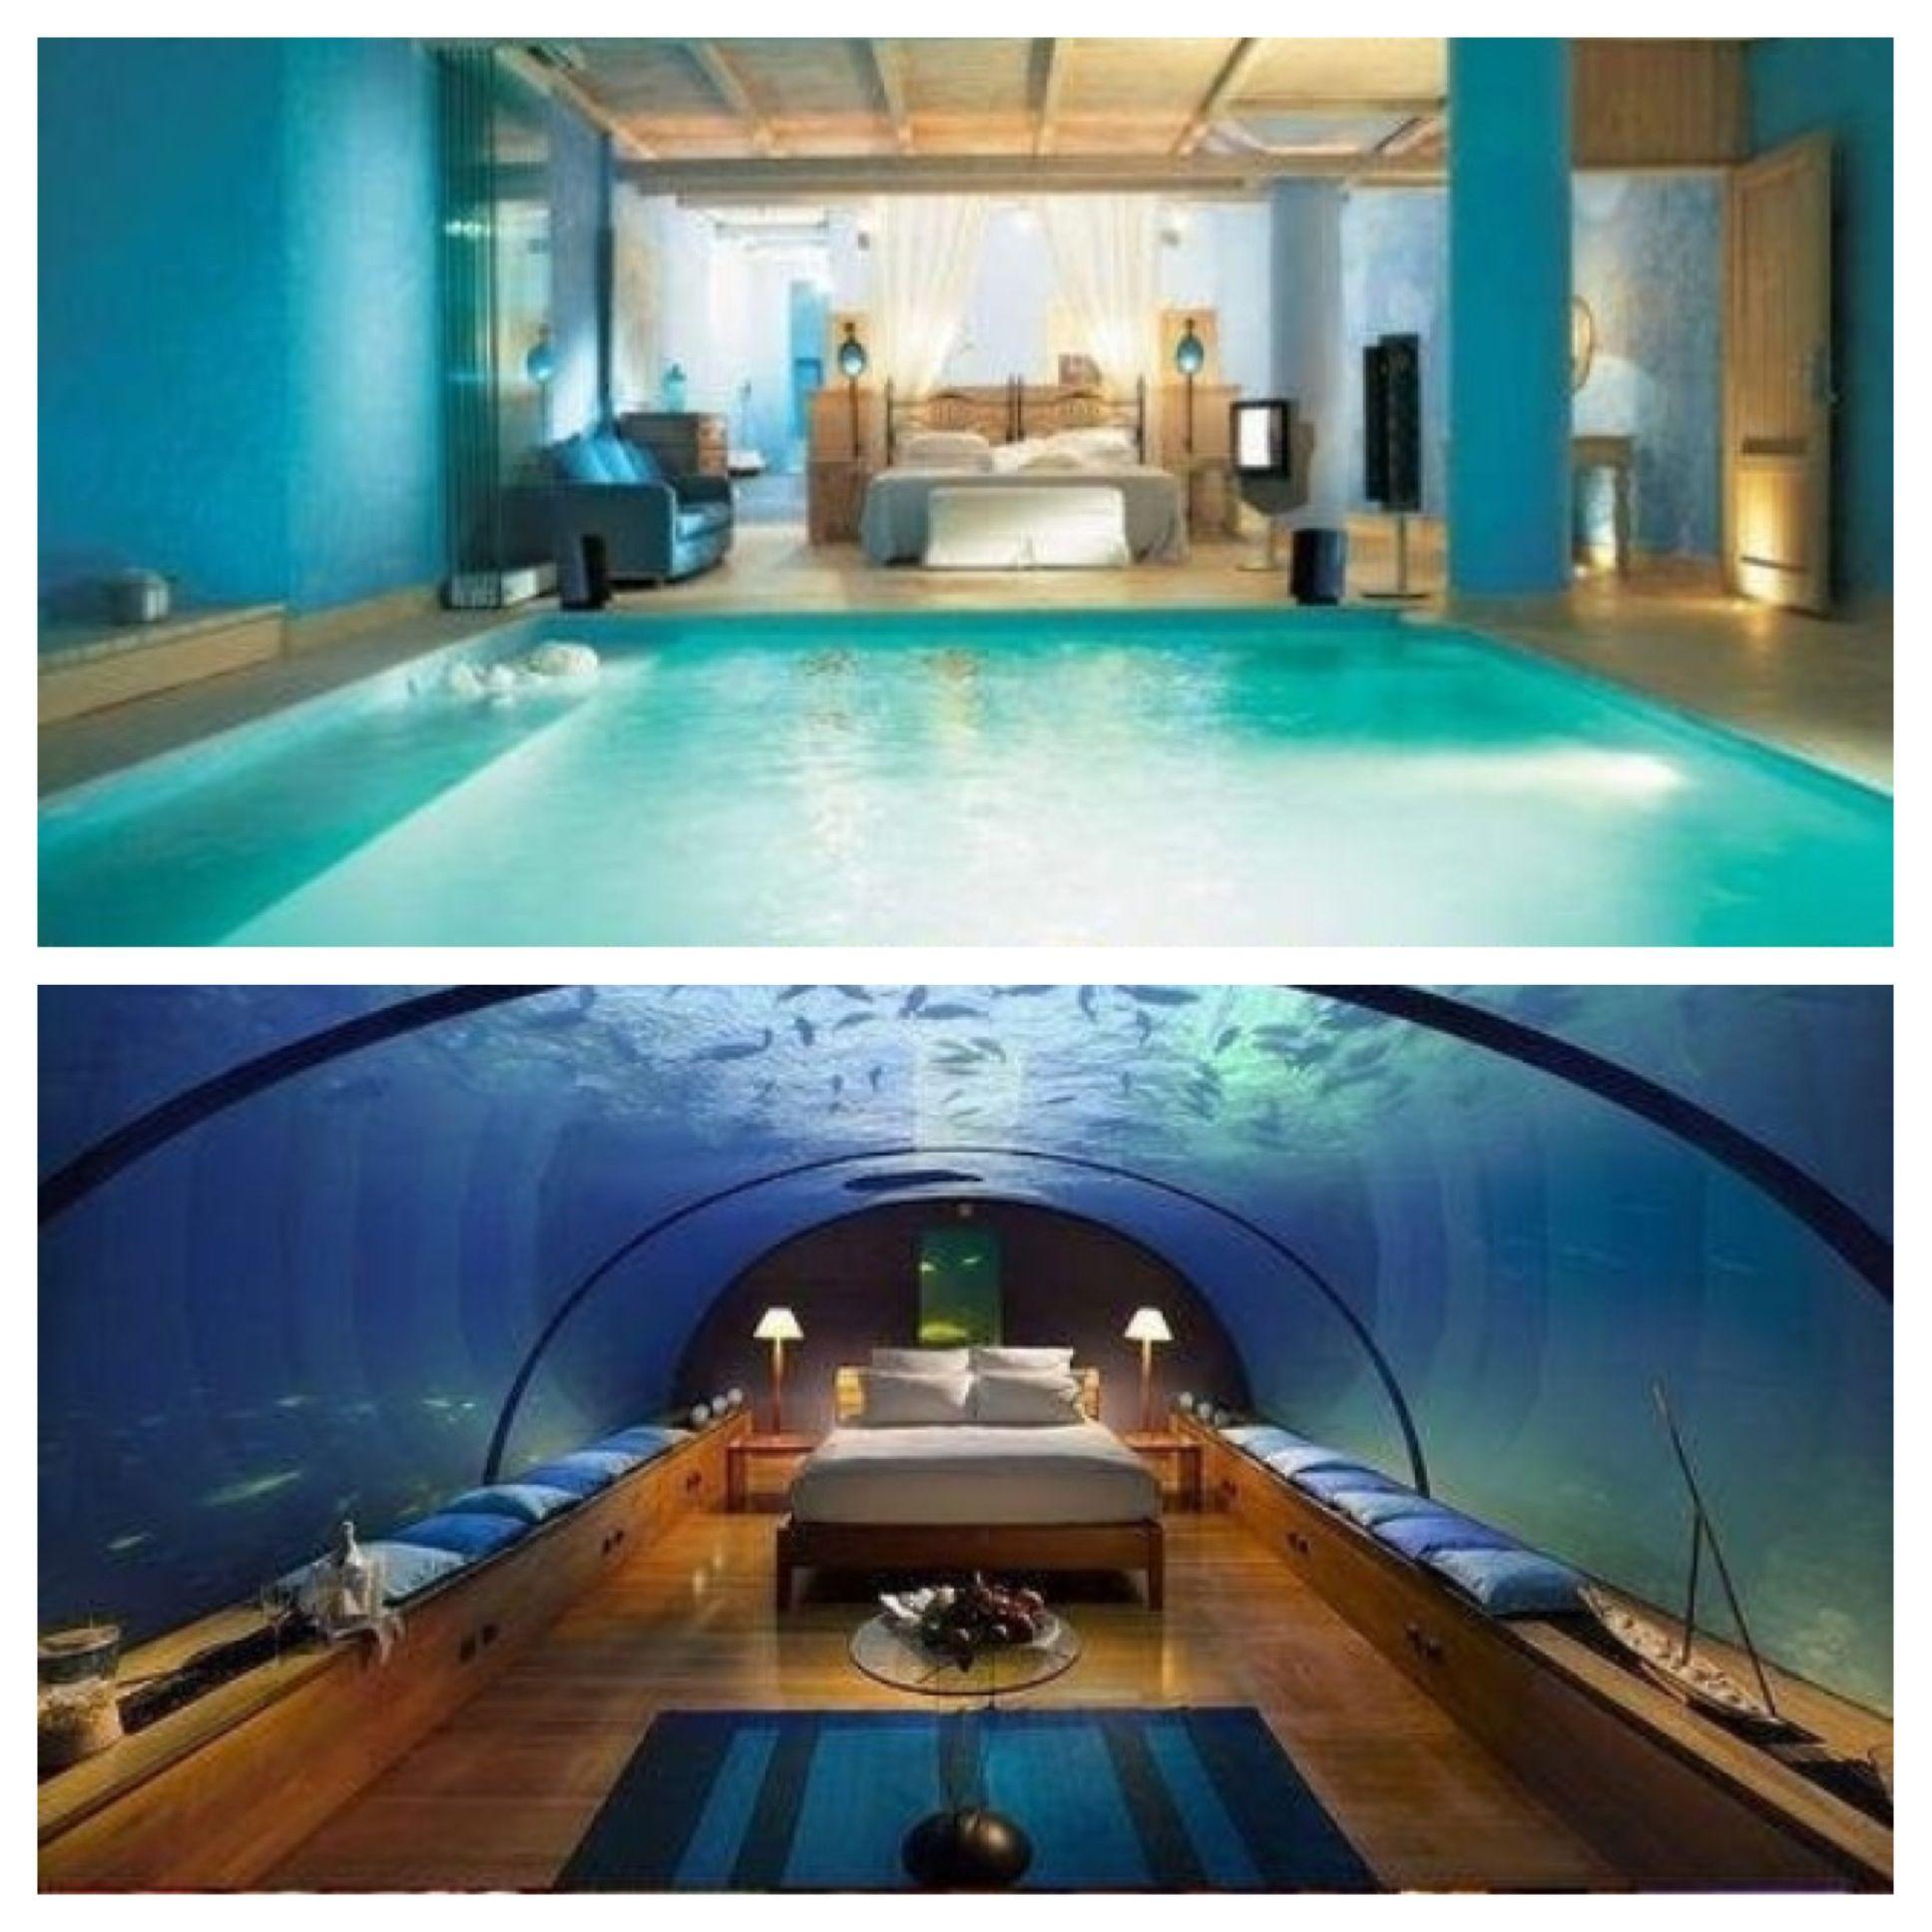 private home aquarium Size 325 000L by Issham Aquatics